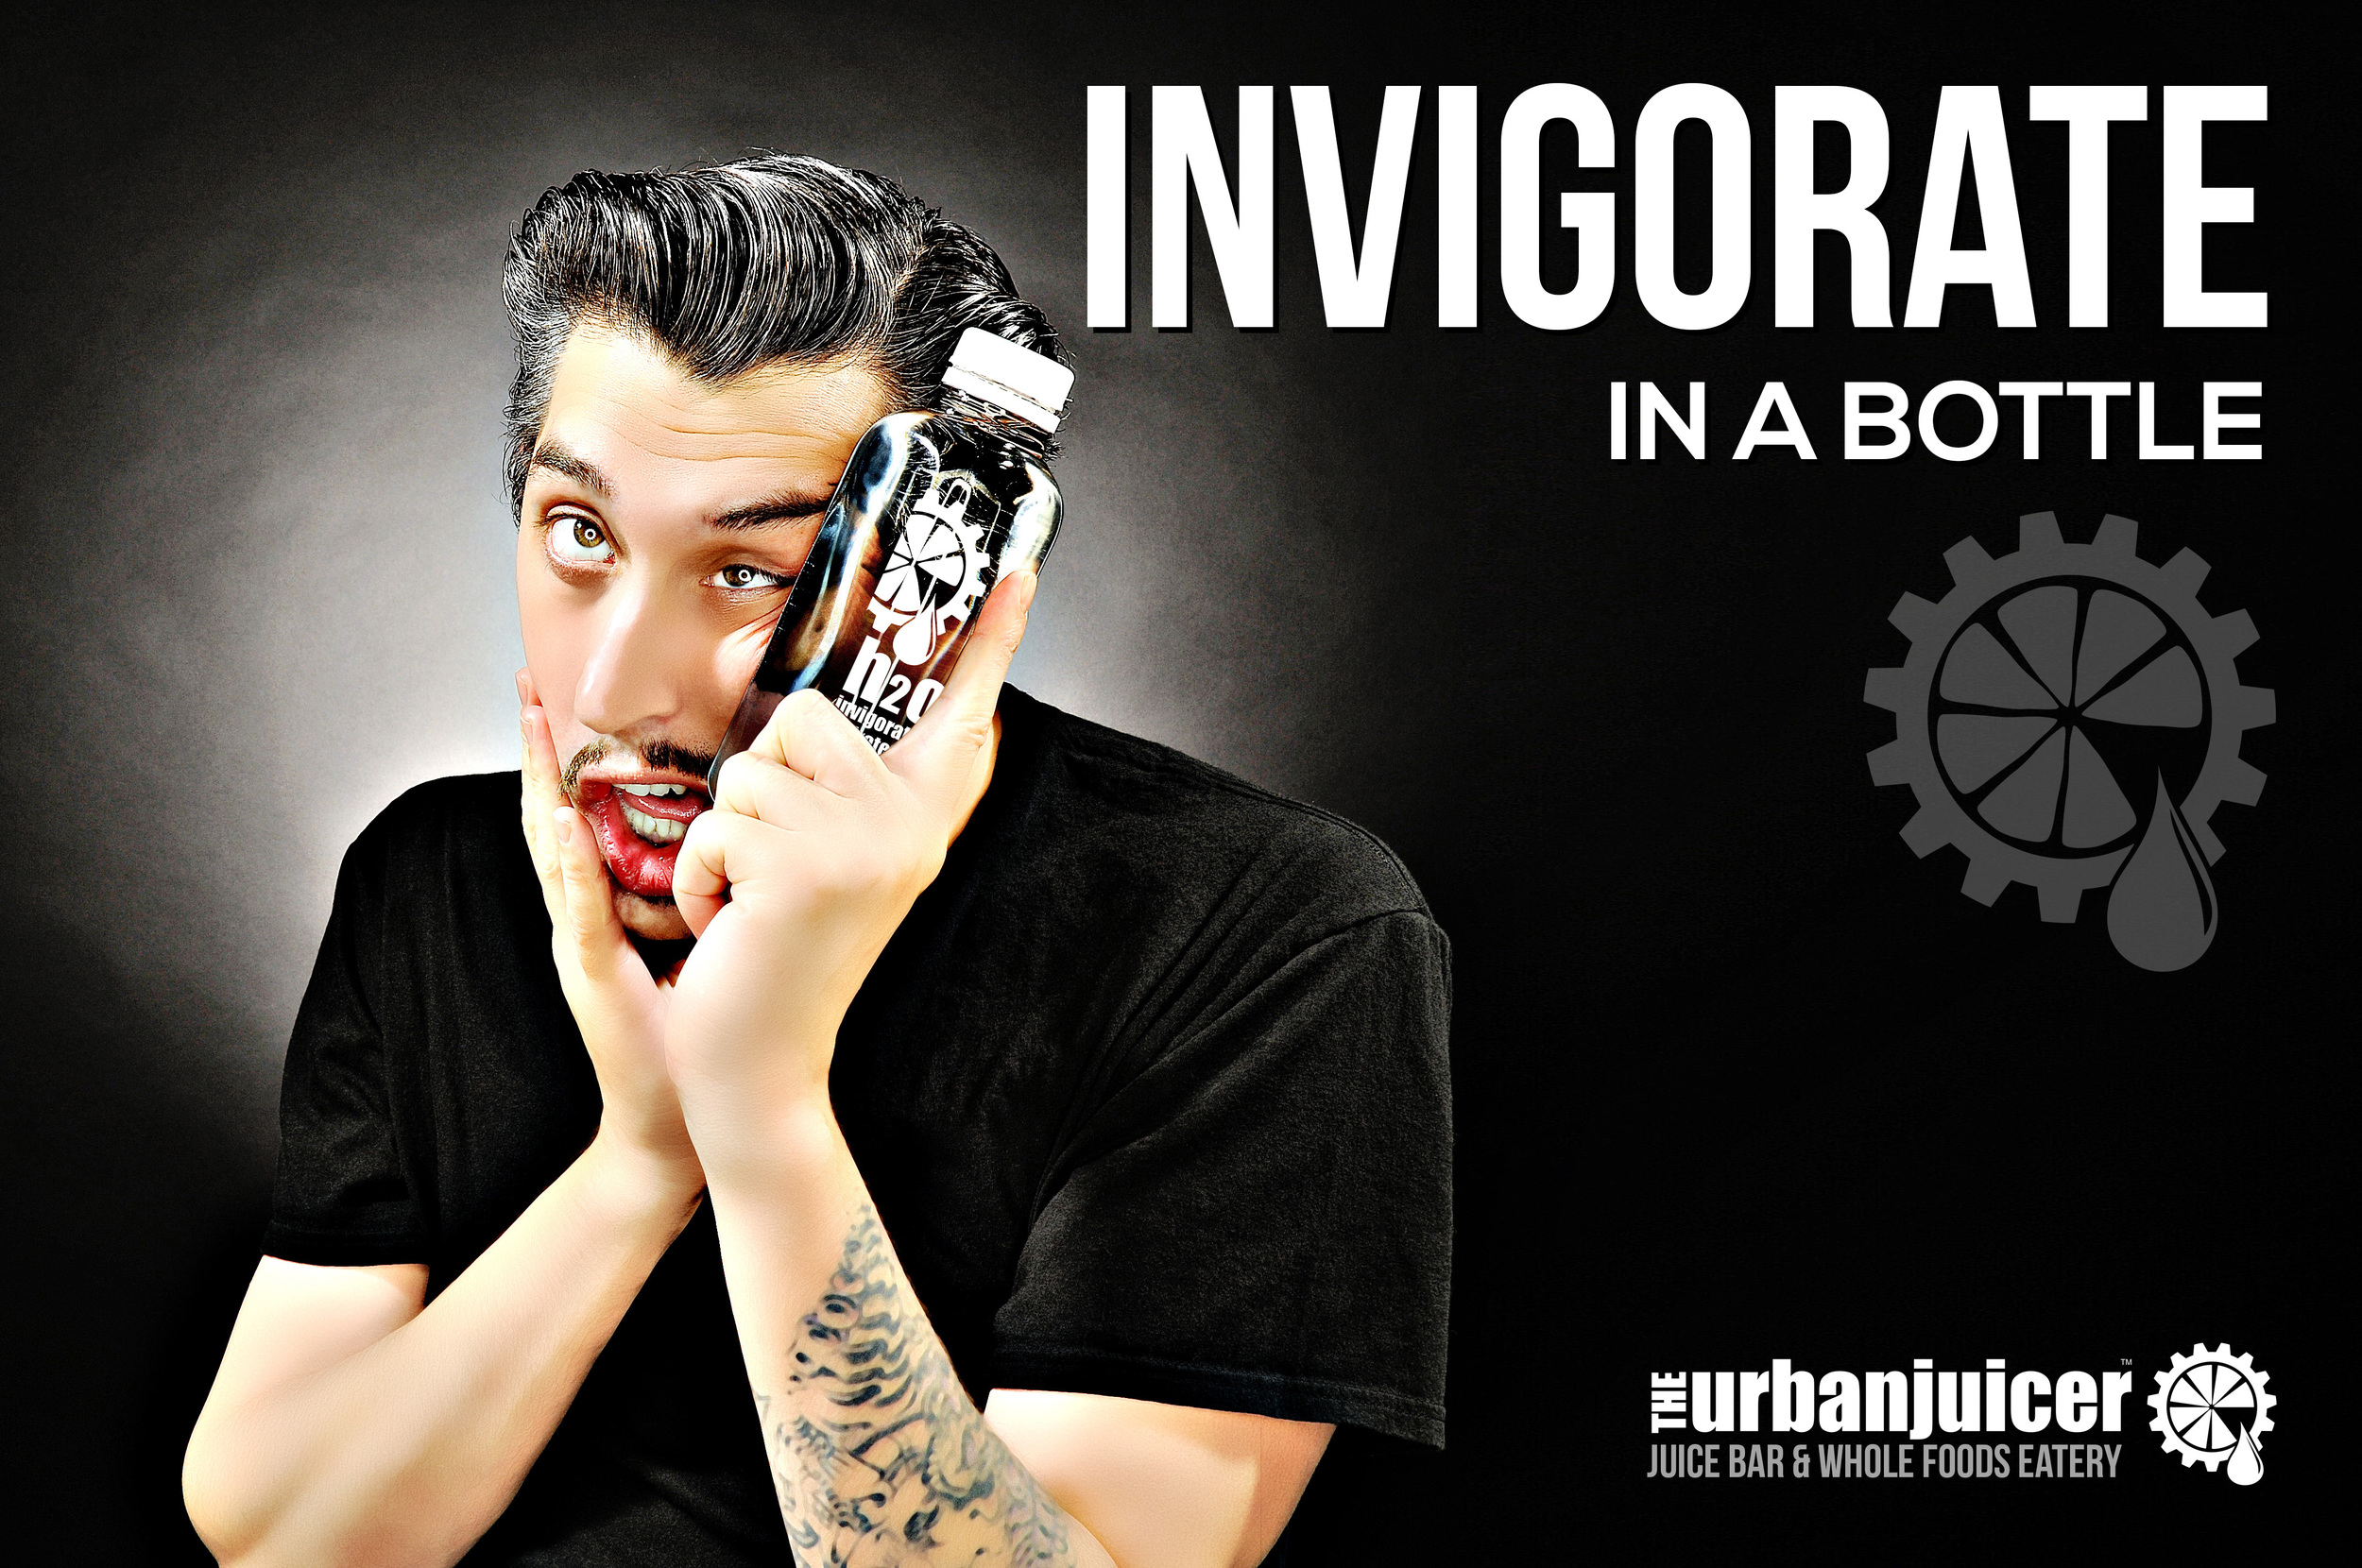 Dustin-UJ-Alkaline-Black-BG-Invigorate-Bonus-01.jpg